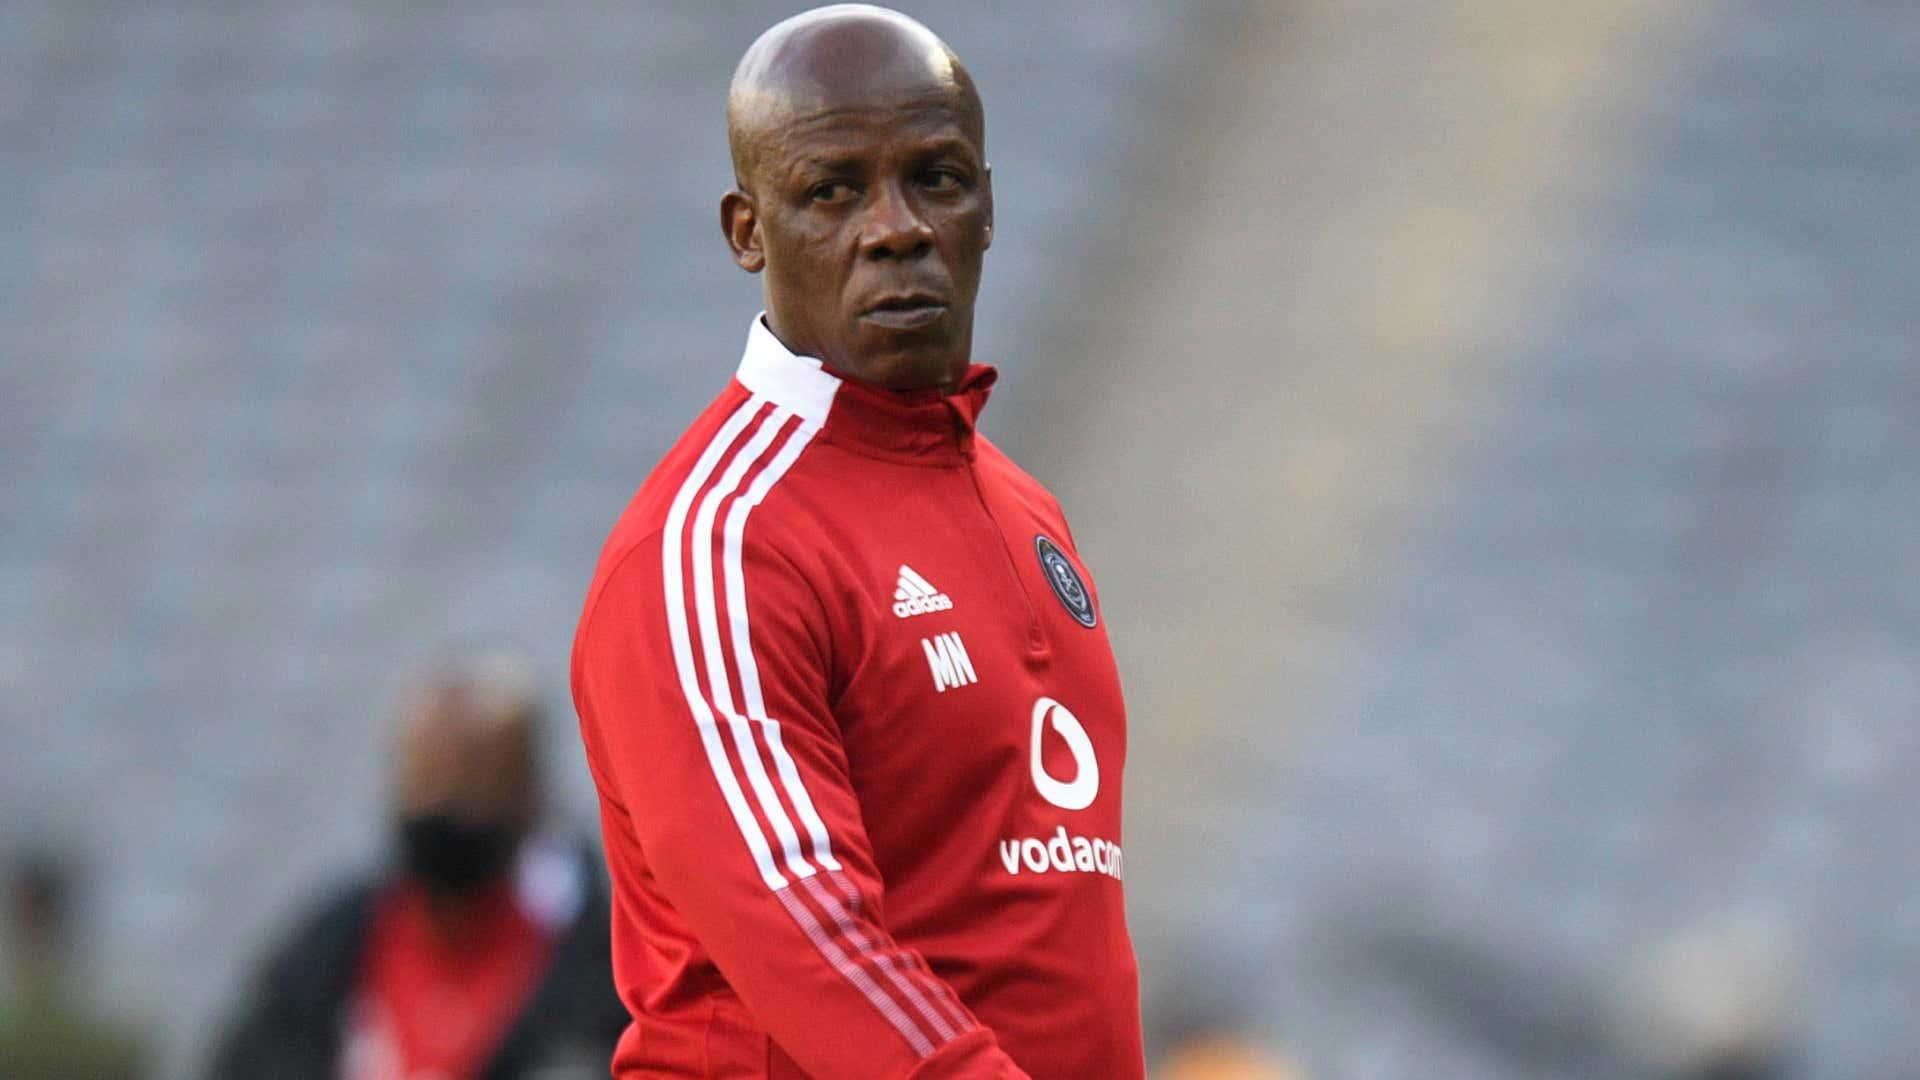 Caf Confederation Cup: Orlando Pirates have capacity to beat Diables Noirs despite Congo treatment – Ncikazi